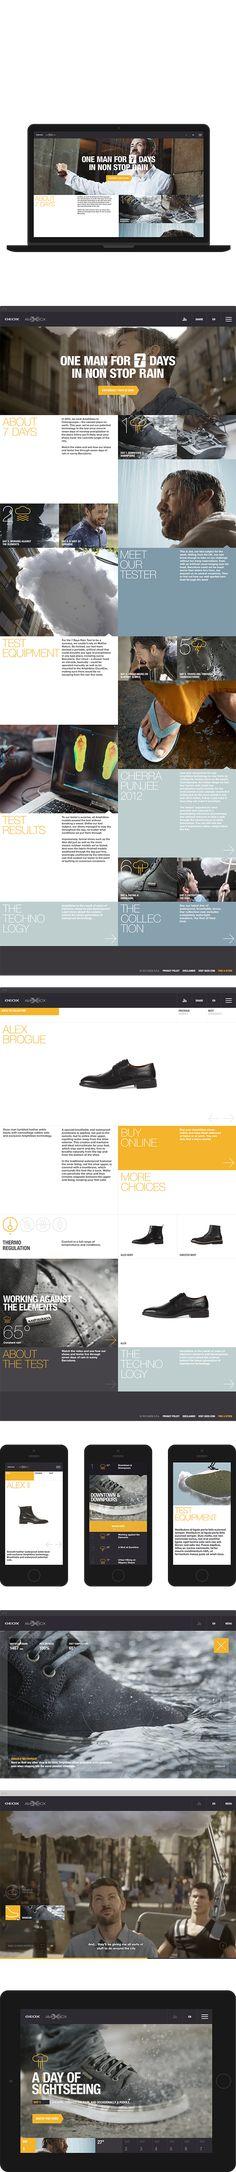 Nice brand identity__Geox 7 Days of Rain by Marius Roosendaal, via Behance